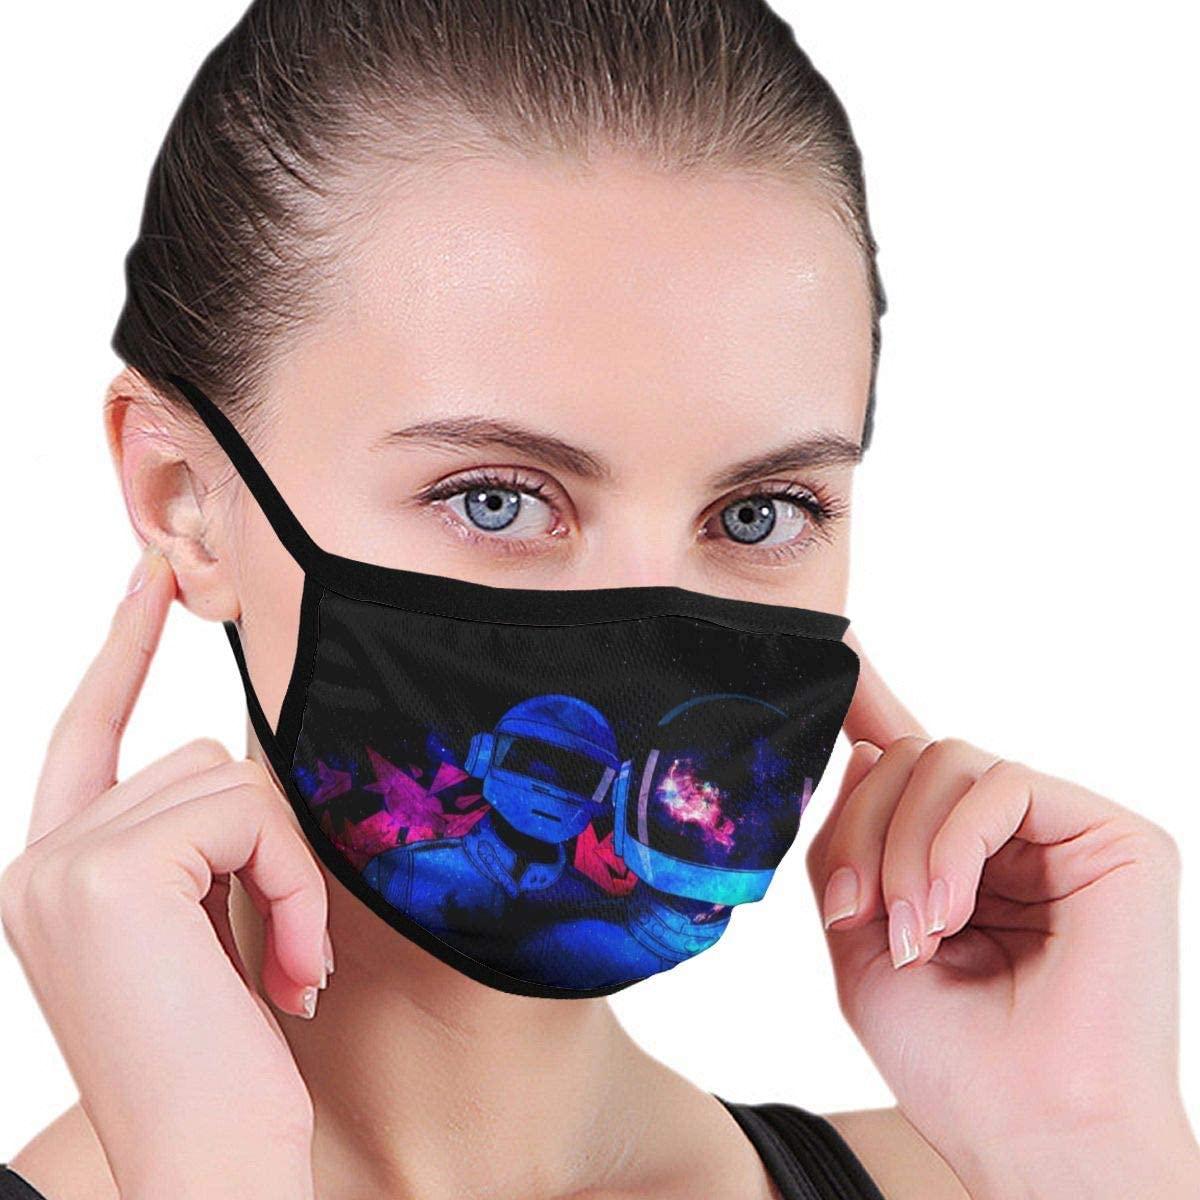 Qwertyi Daft Punk Outdoor Seamless Face Mouth Safety Reusable Balaclava